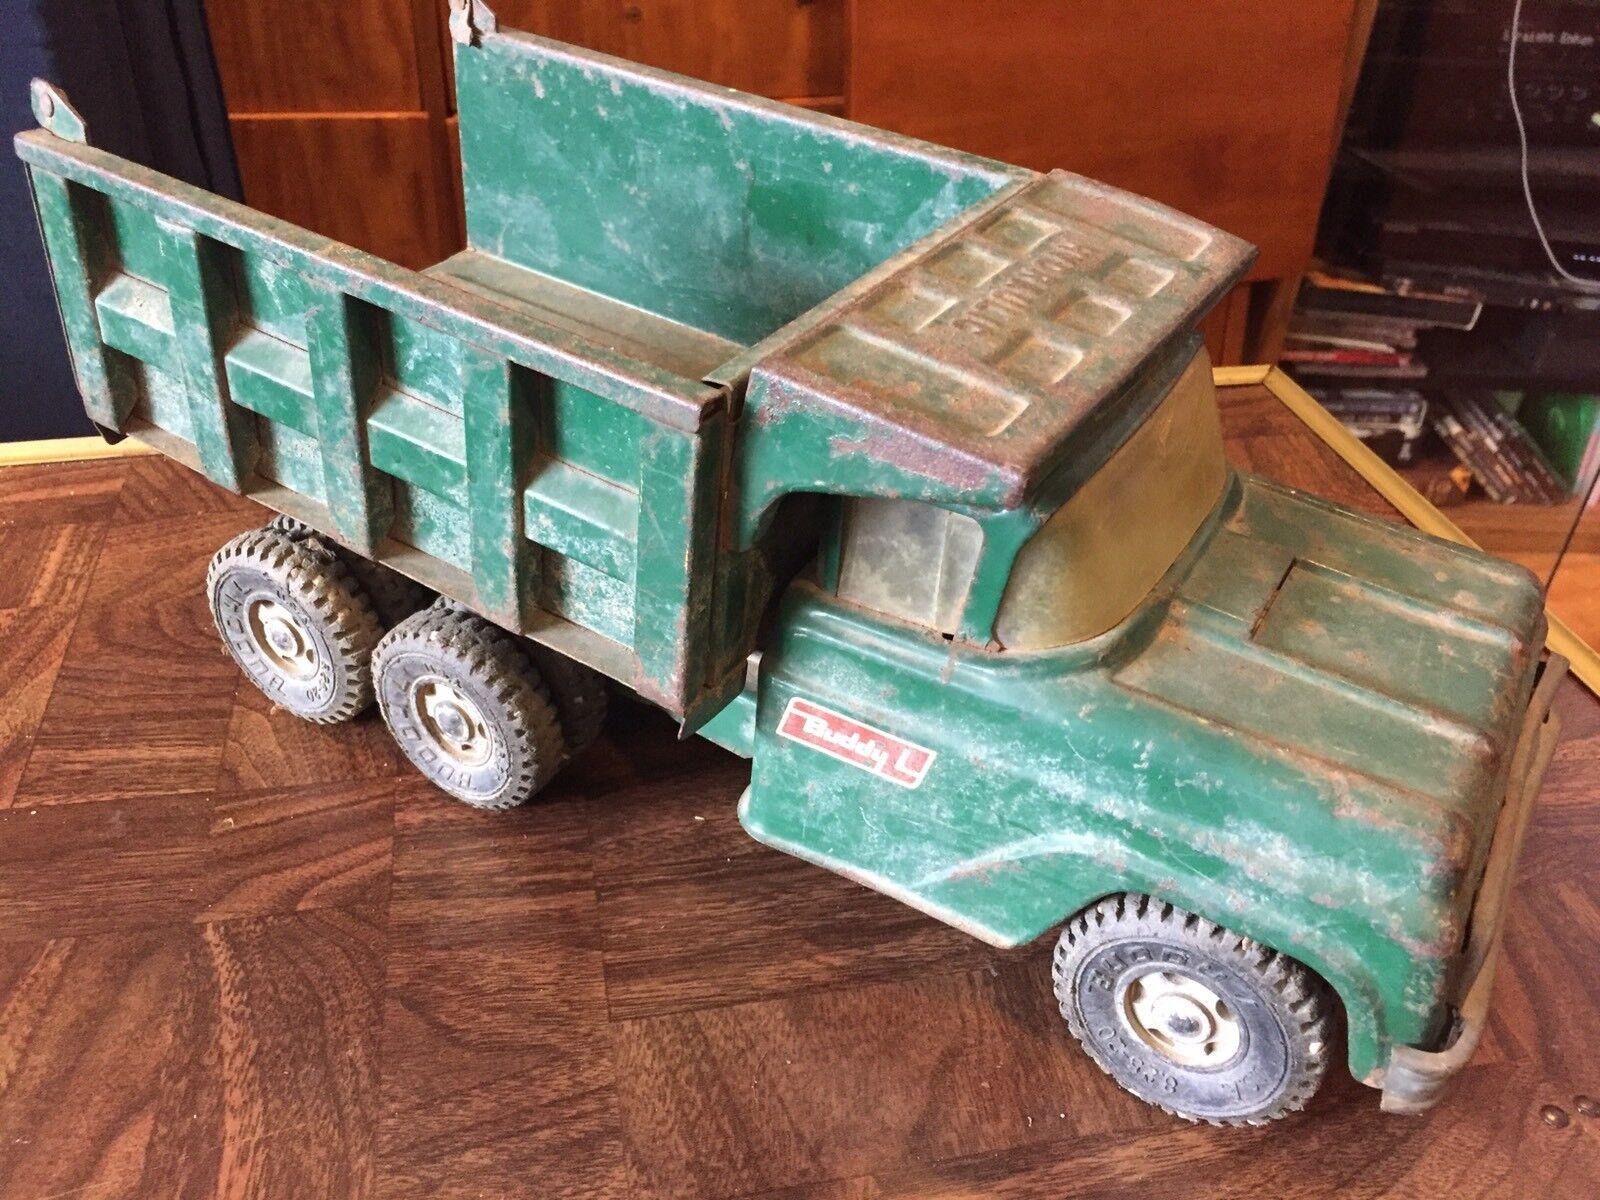 Buddy L Pressé Acier Essieu Tandem Hydraulique Camion benne-Vert-Fresh Barn Find